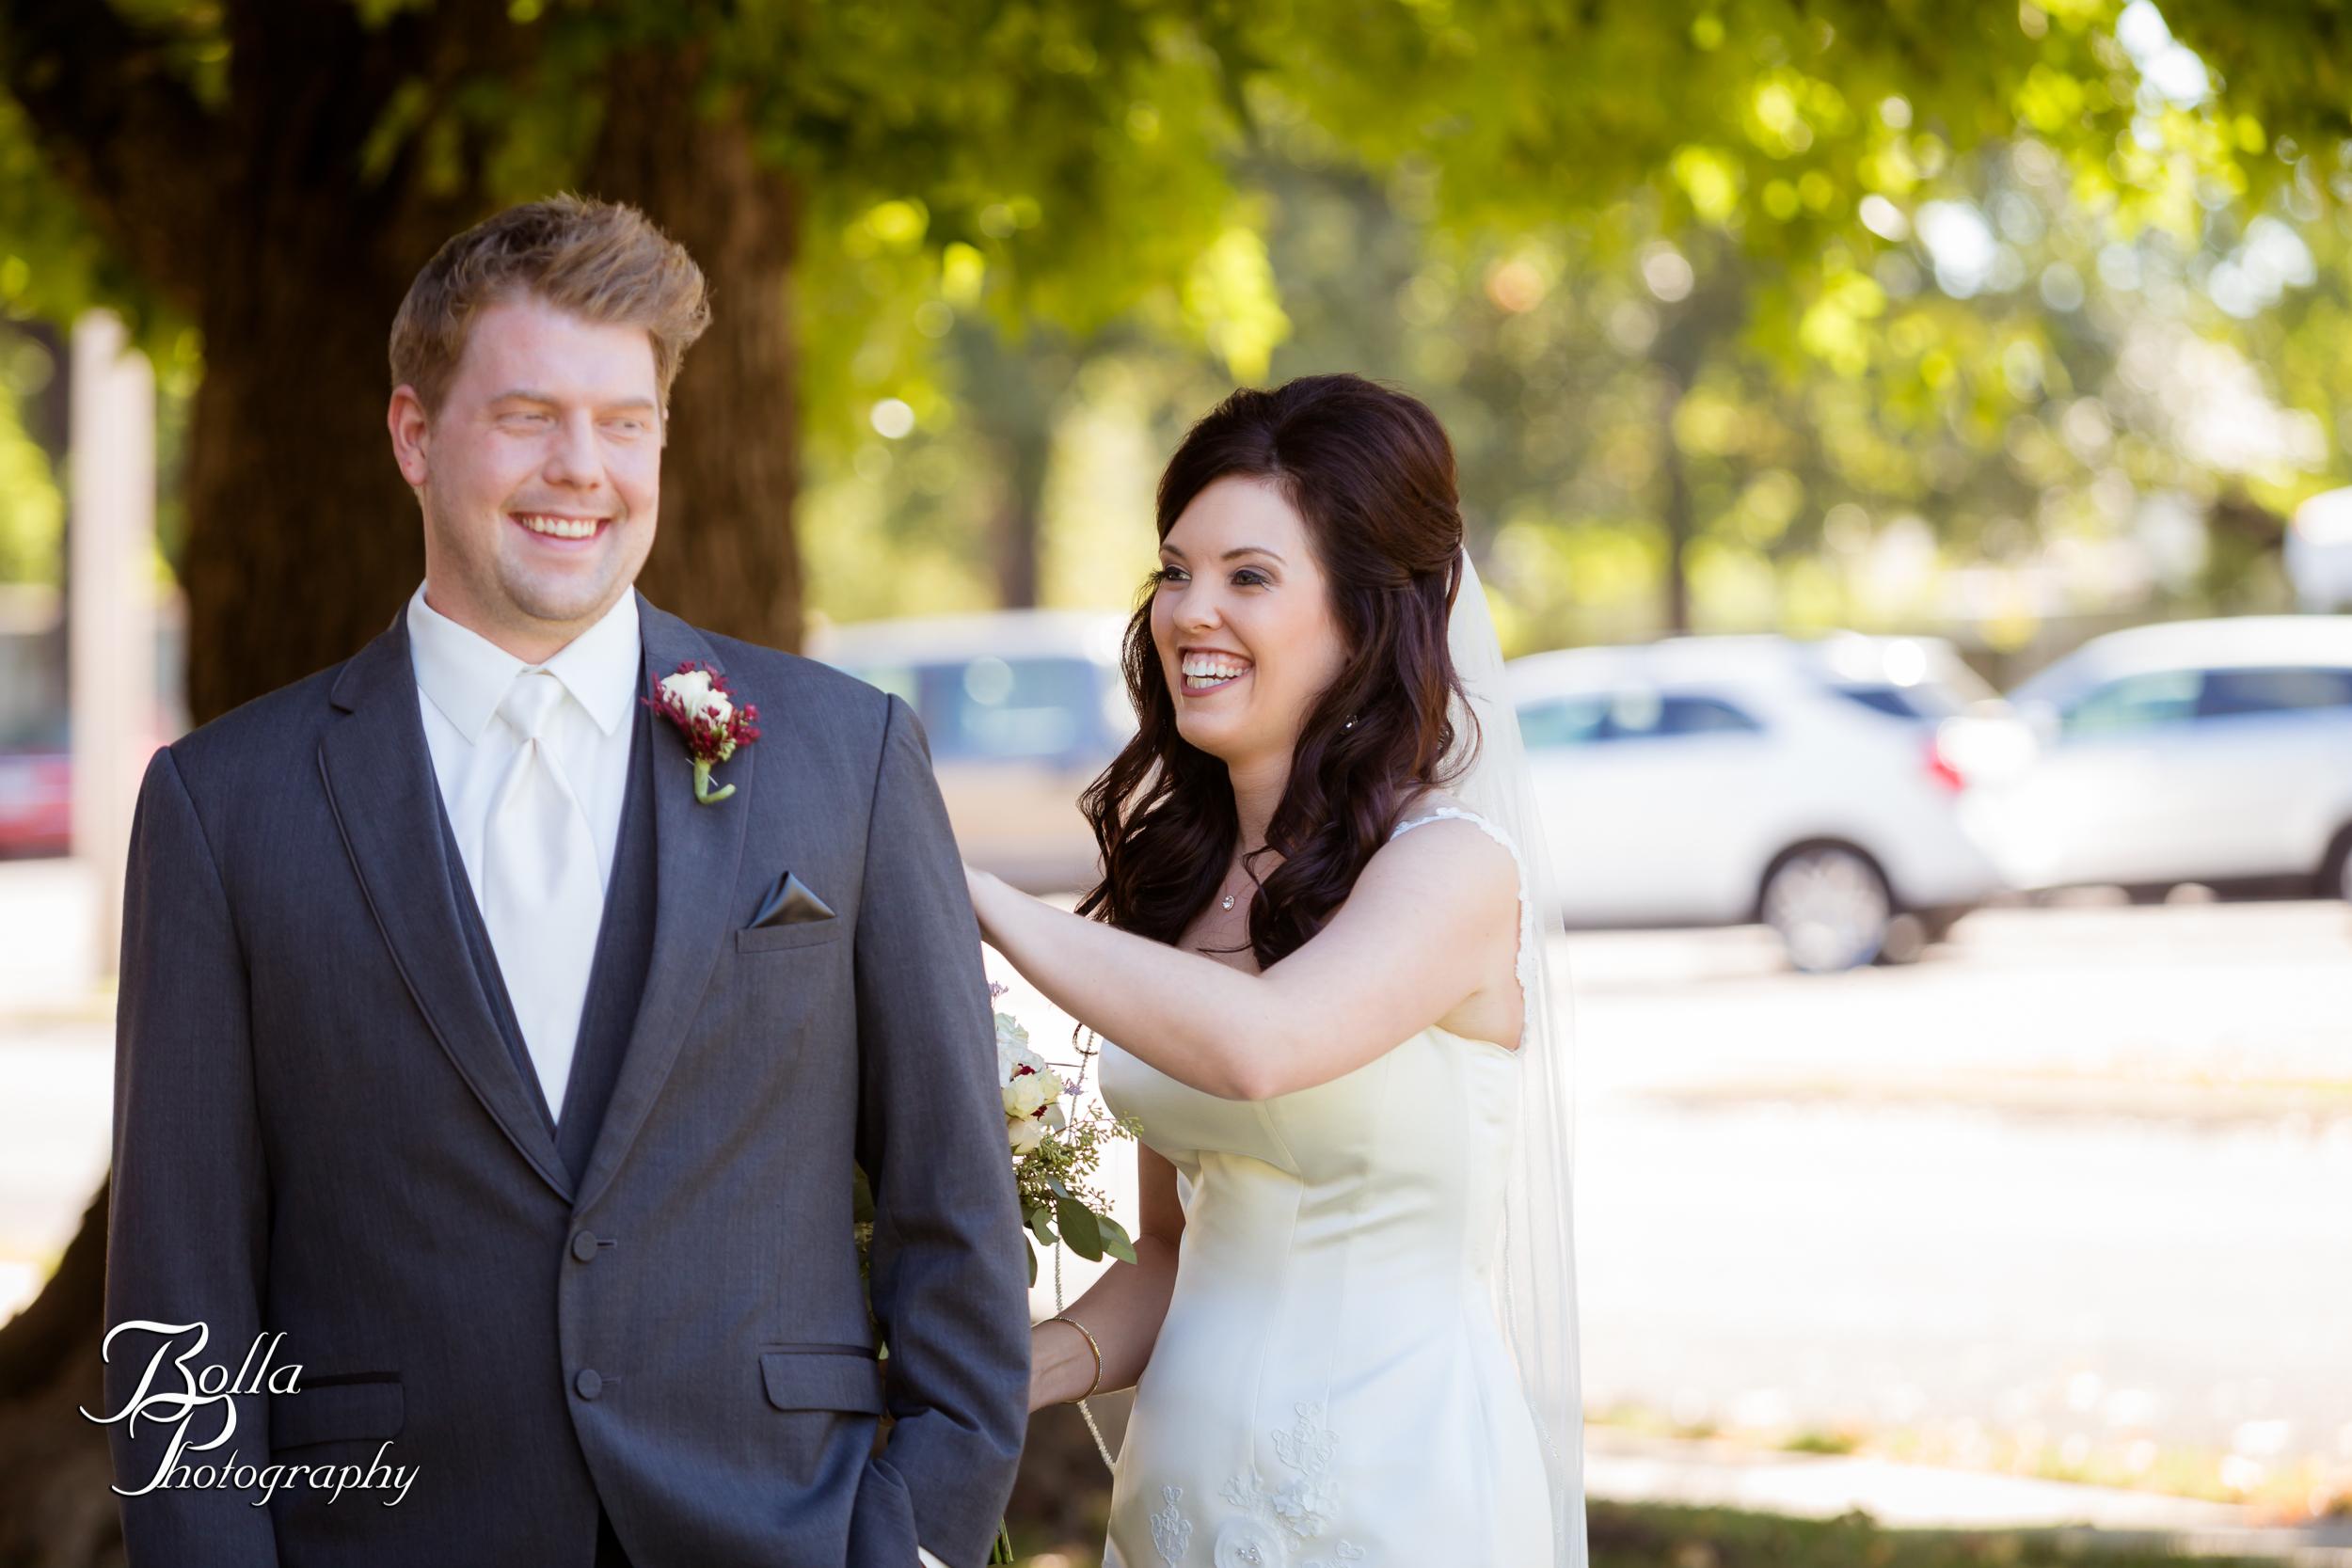 Bolla_photography_edwardsville_wedding_photographer_st_louis_weddings_Reilmann-0074.jpg